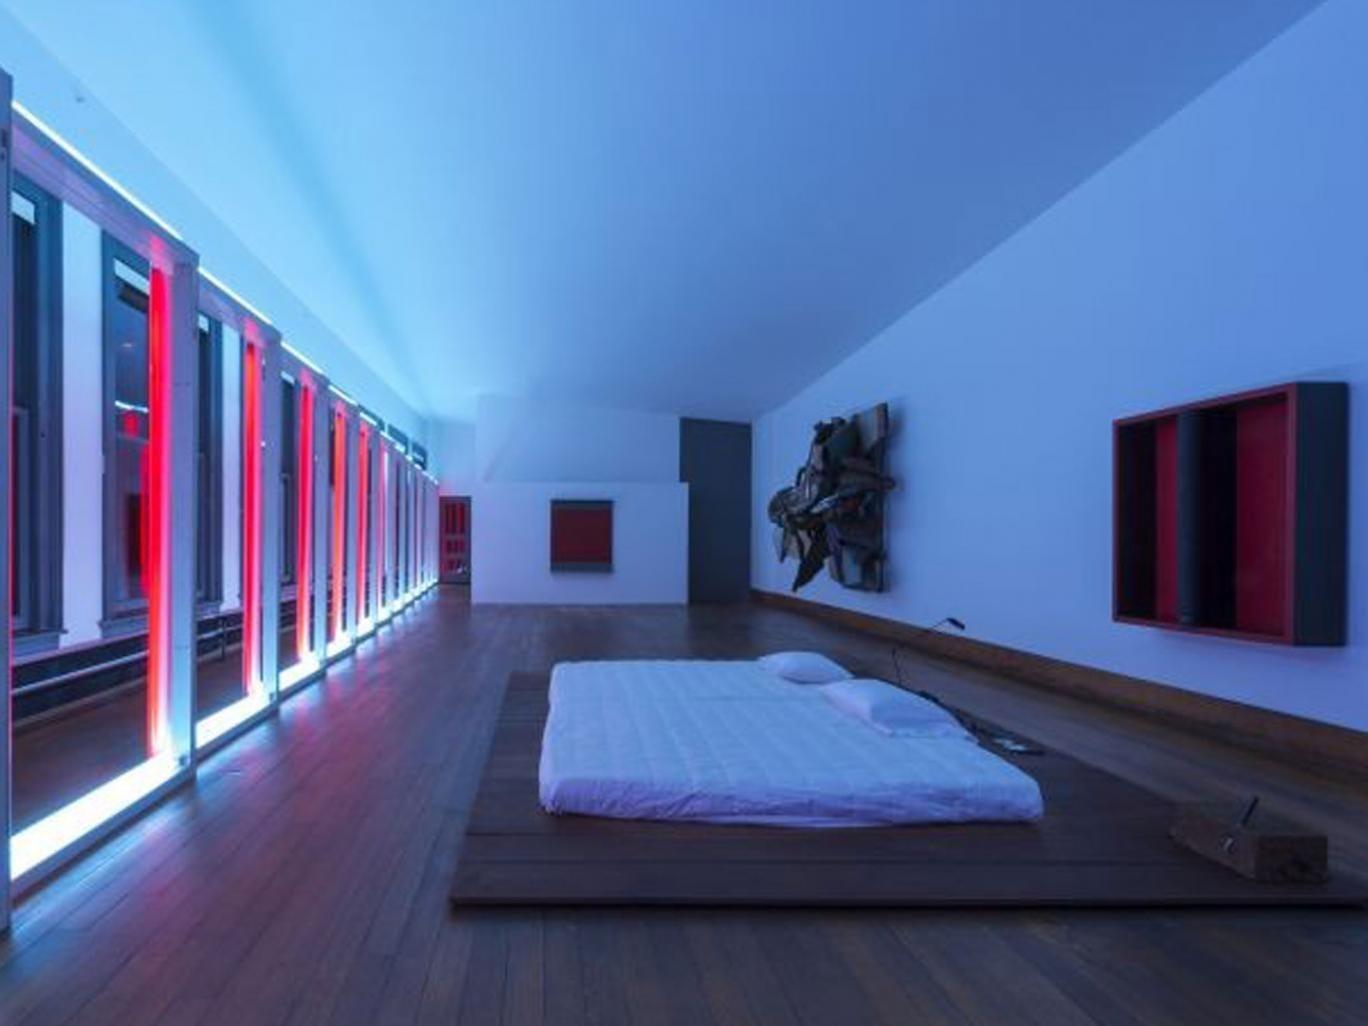 Donald Judd's New York house